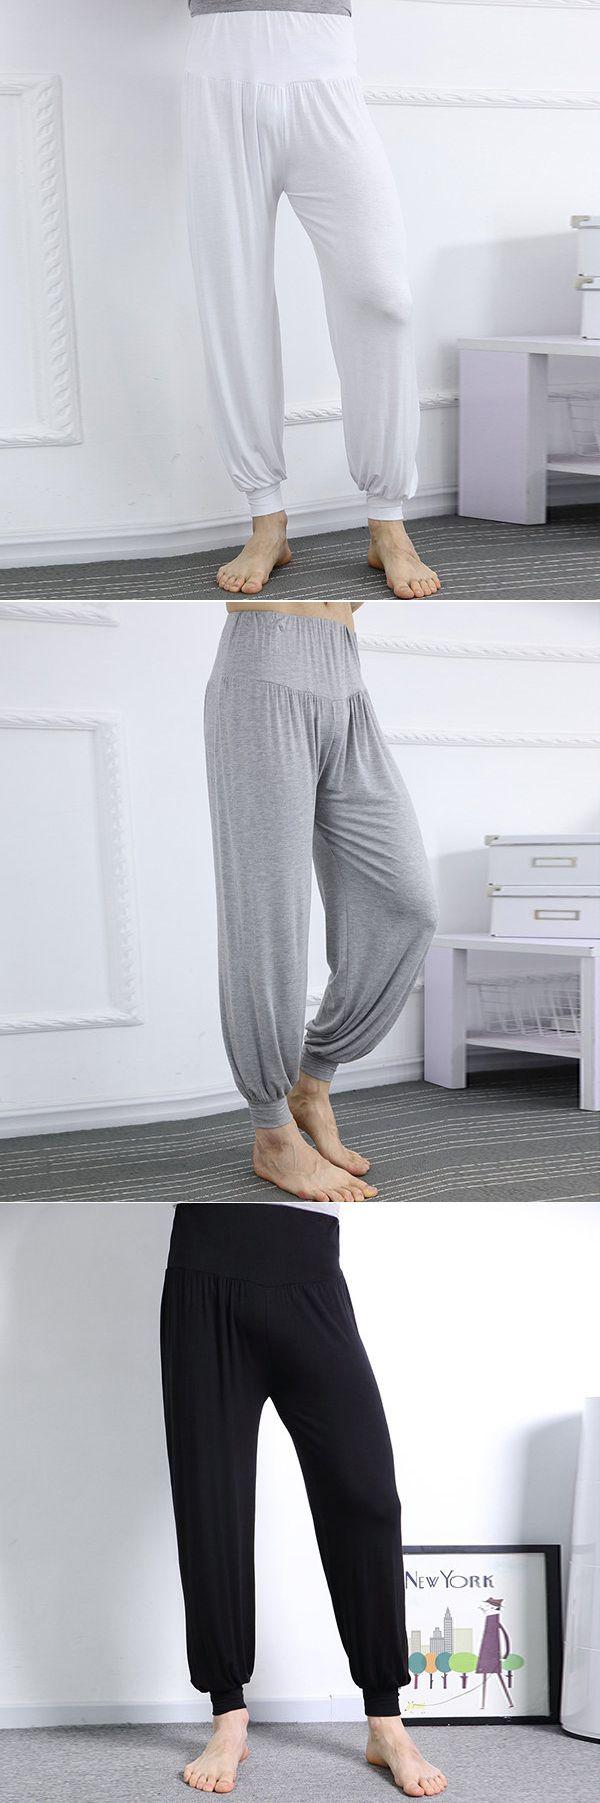 US$11.47#Cotton Bloomers_ sleepwear_ sleepwear for men_ sleepwear for men pajama set_ mens sleepwear_ mens sleepwear prints_ mens sleepwear pjs_ men's sleepwear_ mens pants_ pants